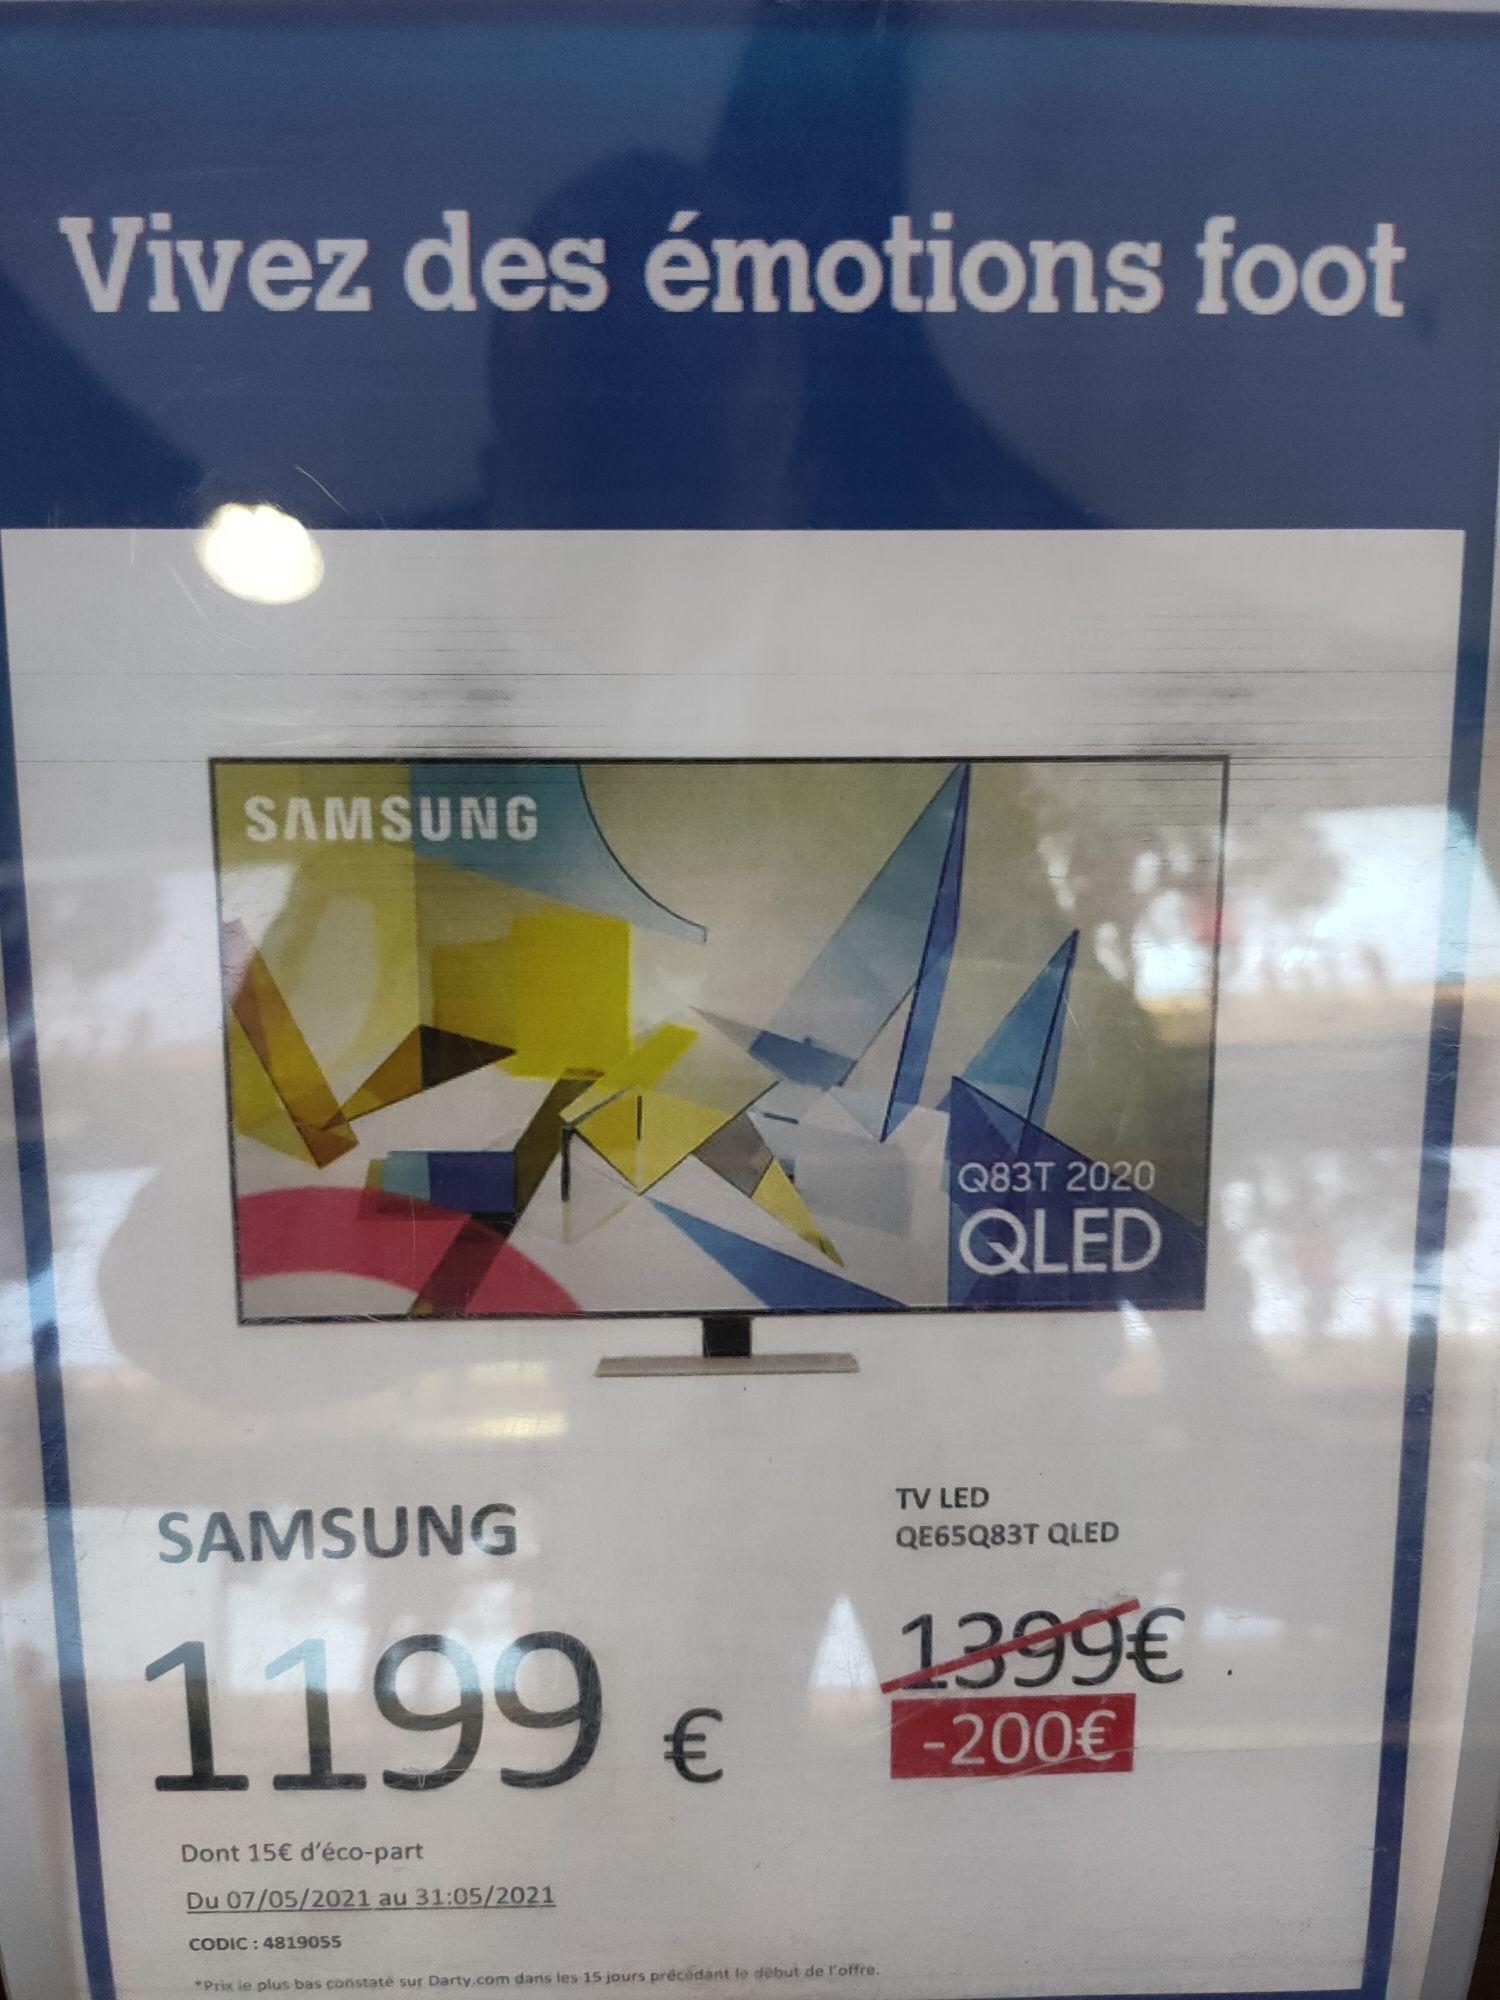 "TV QLED 65"" Samsung QE65Q83T - 4K UHD, HDR 10+, Smart TV - Bercy (94)"